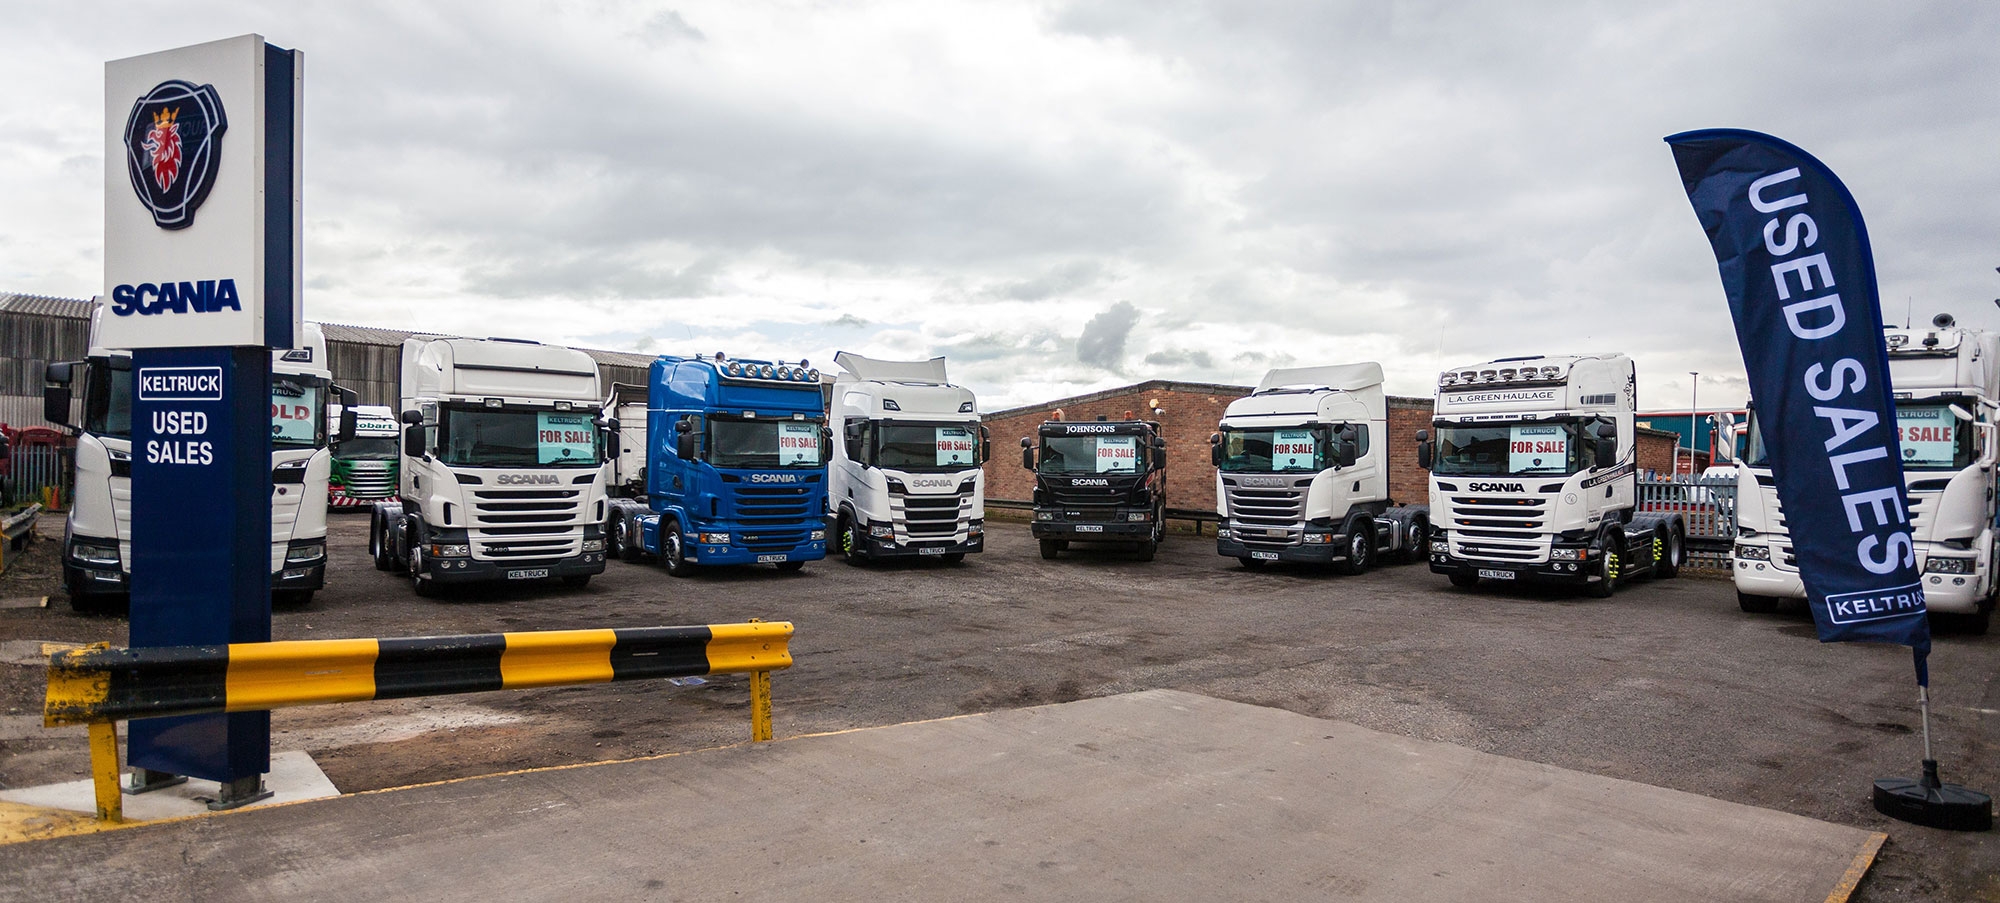 Scania Used Trucks Archives - Keltruck Scania